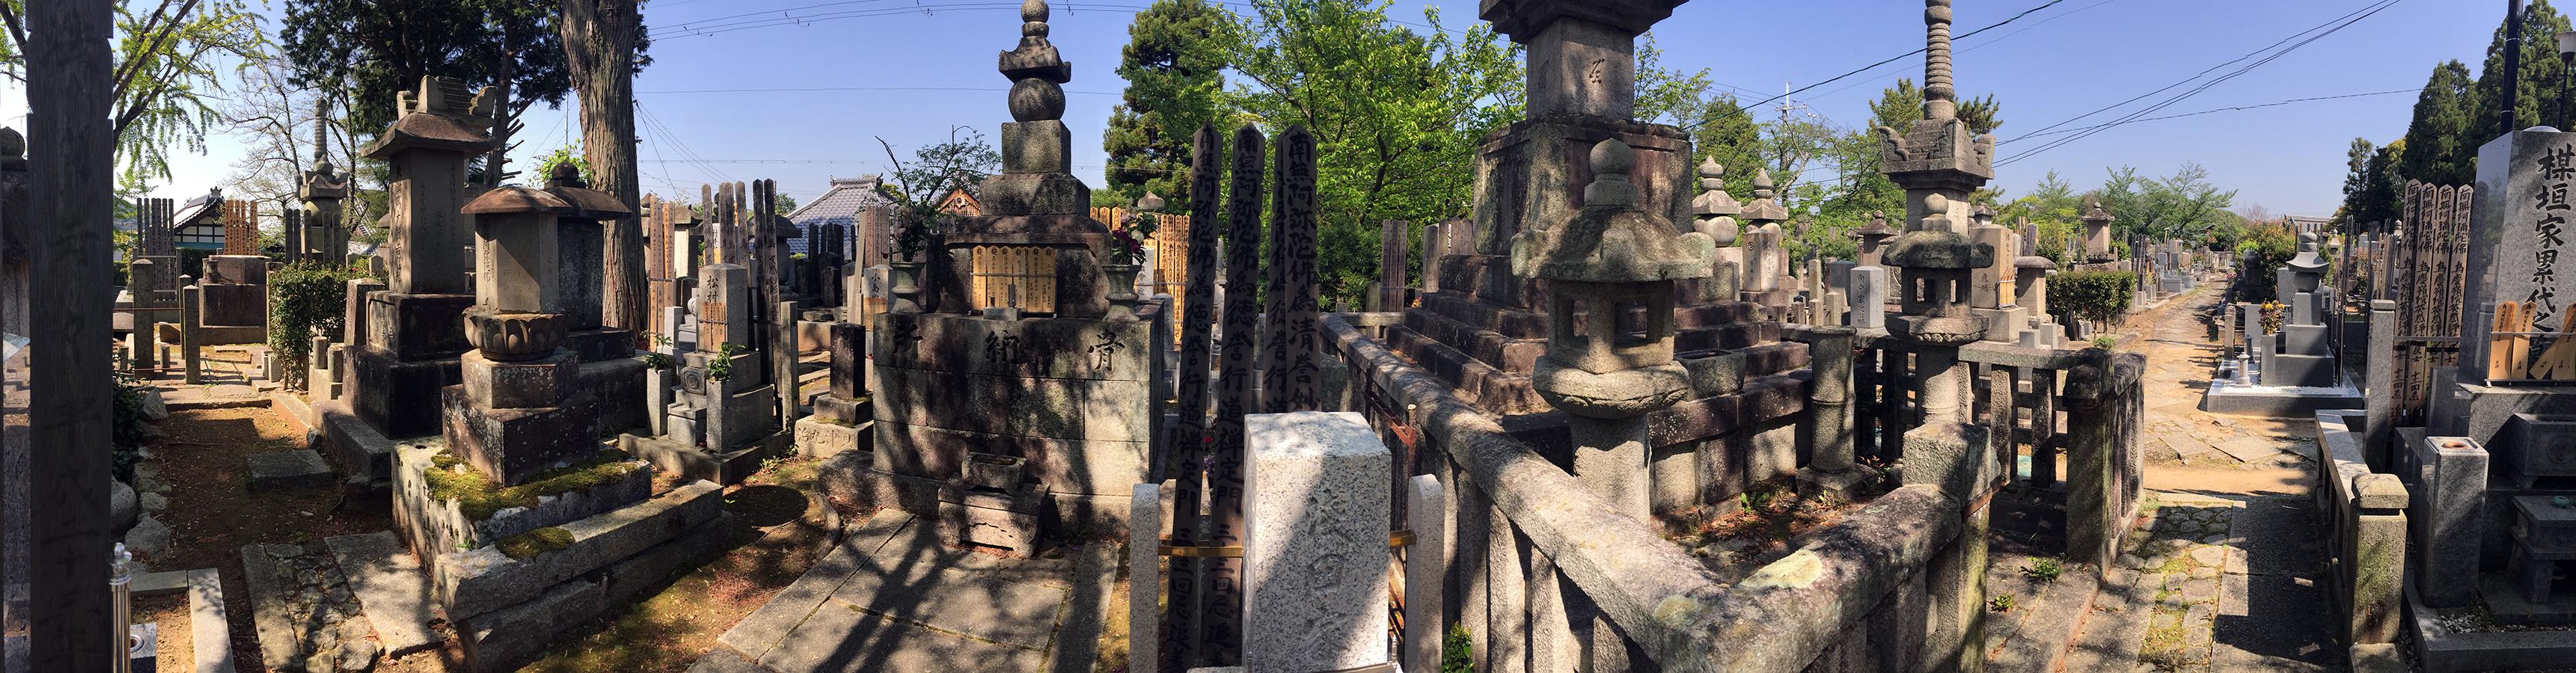 IMG_0796_pano cemetery_MR